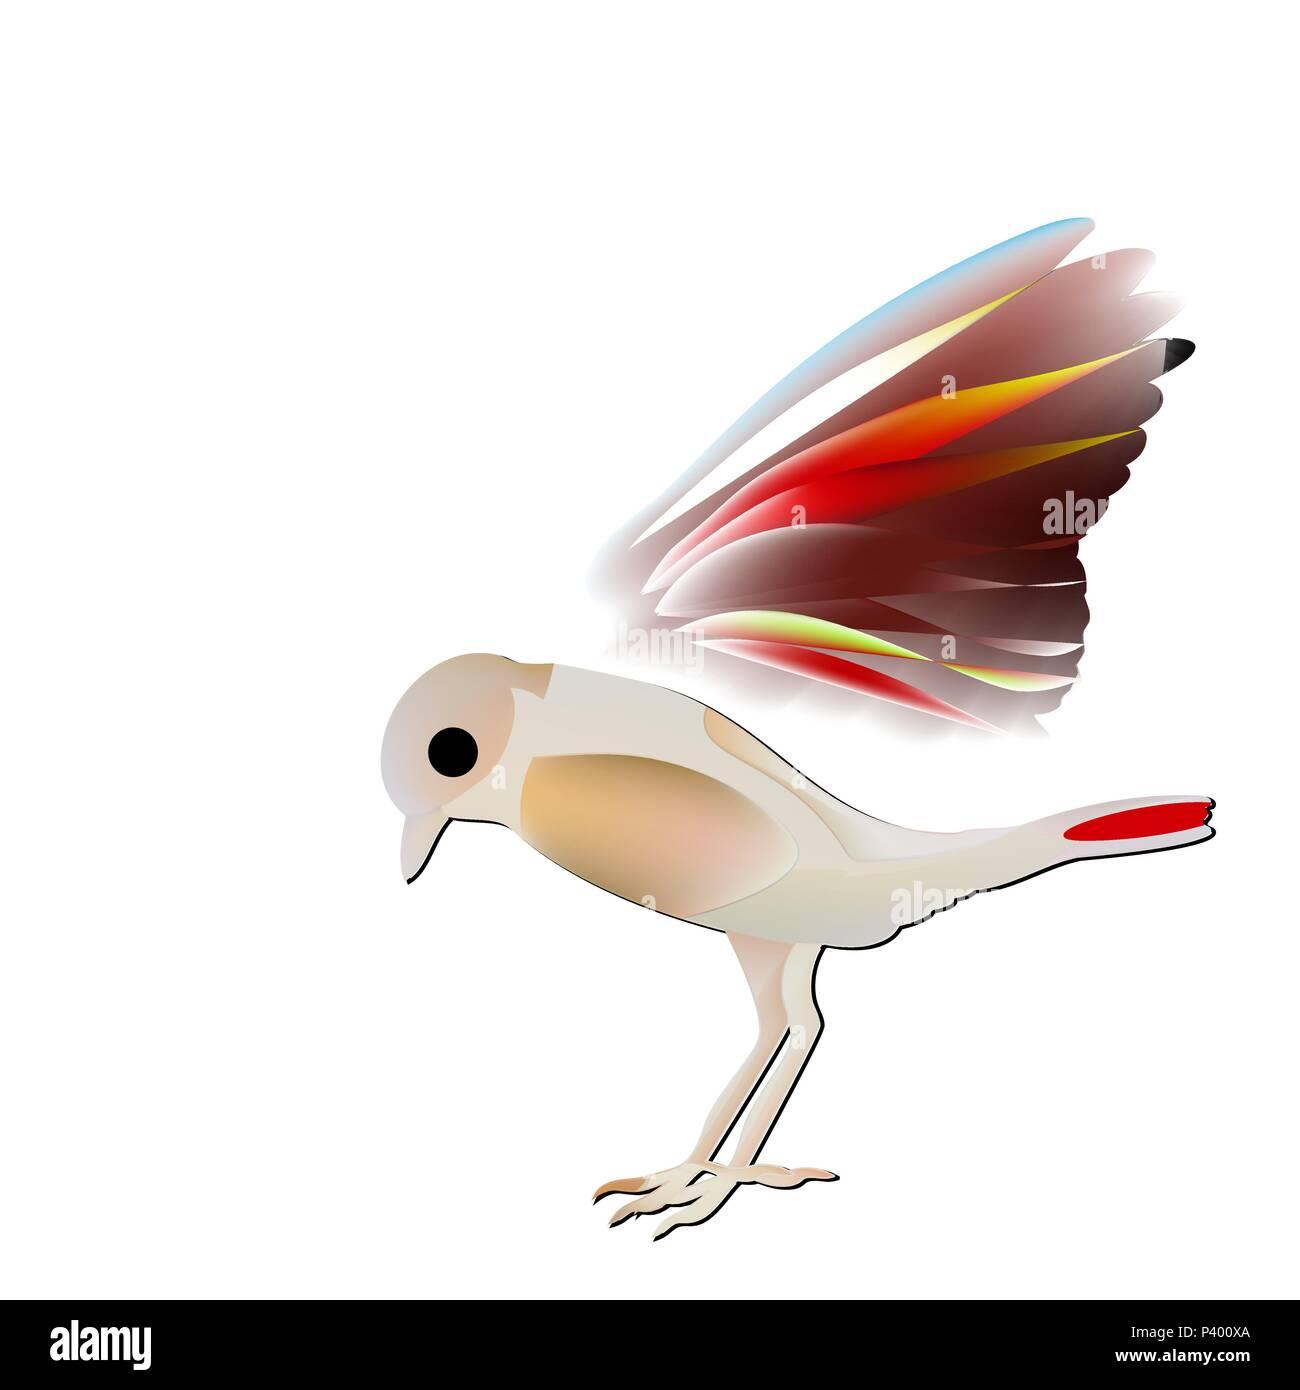 rare passerine bird, Saxicola insignis with a red abdomen. - Stock Image